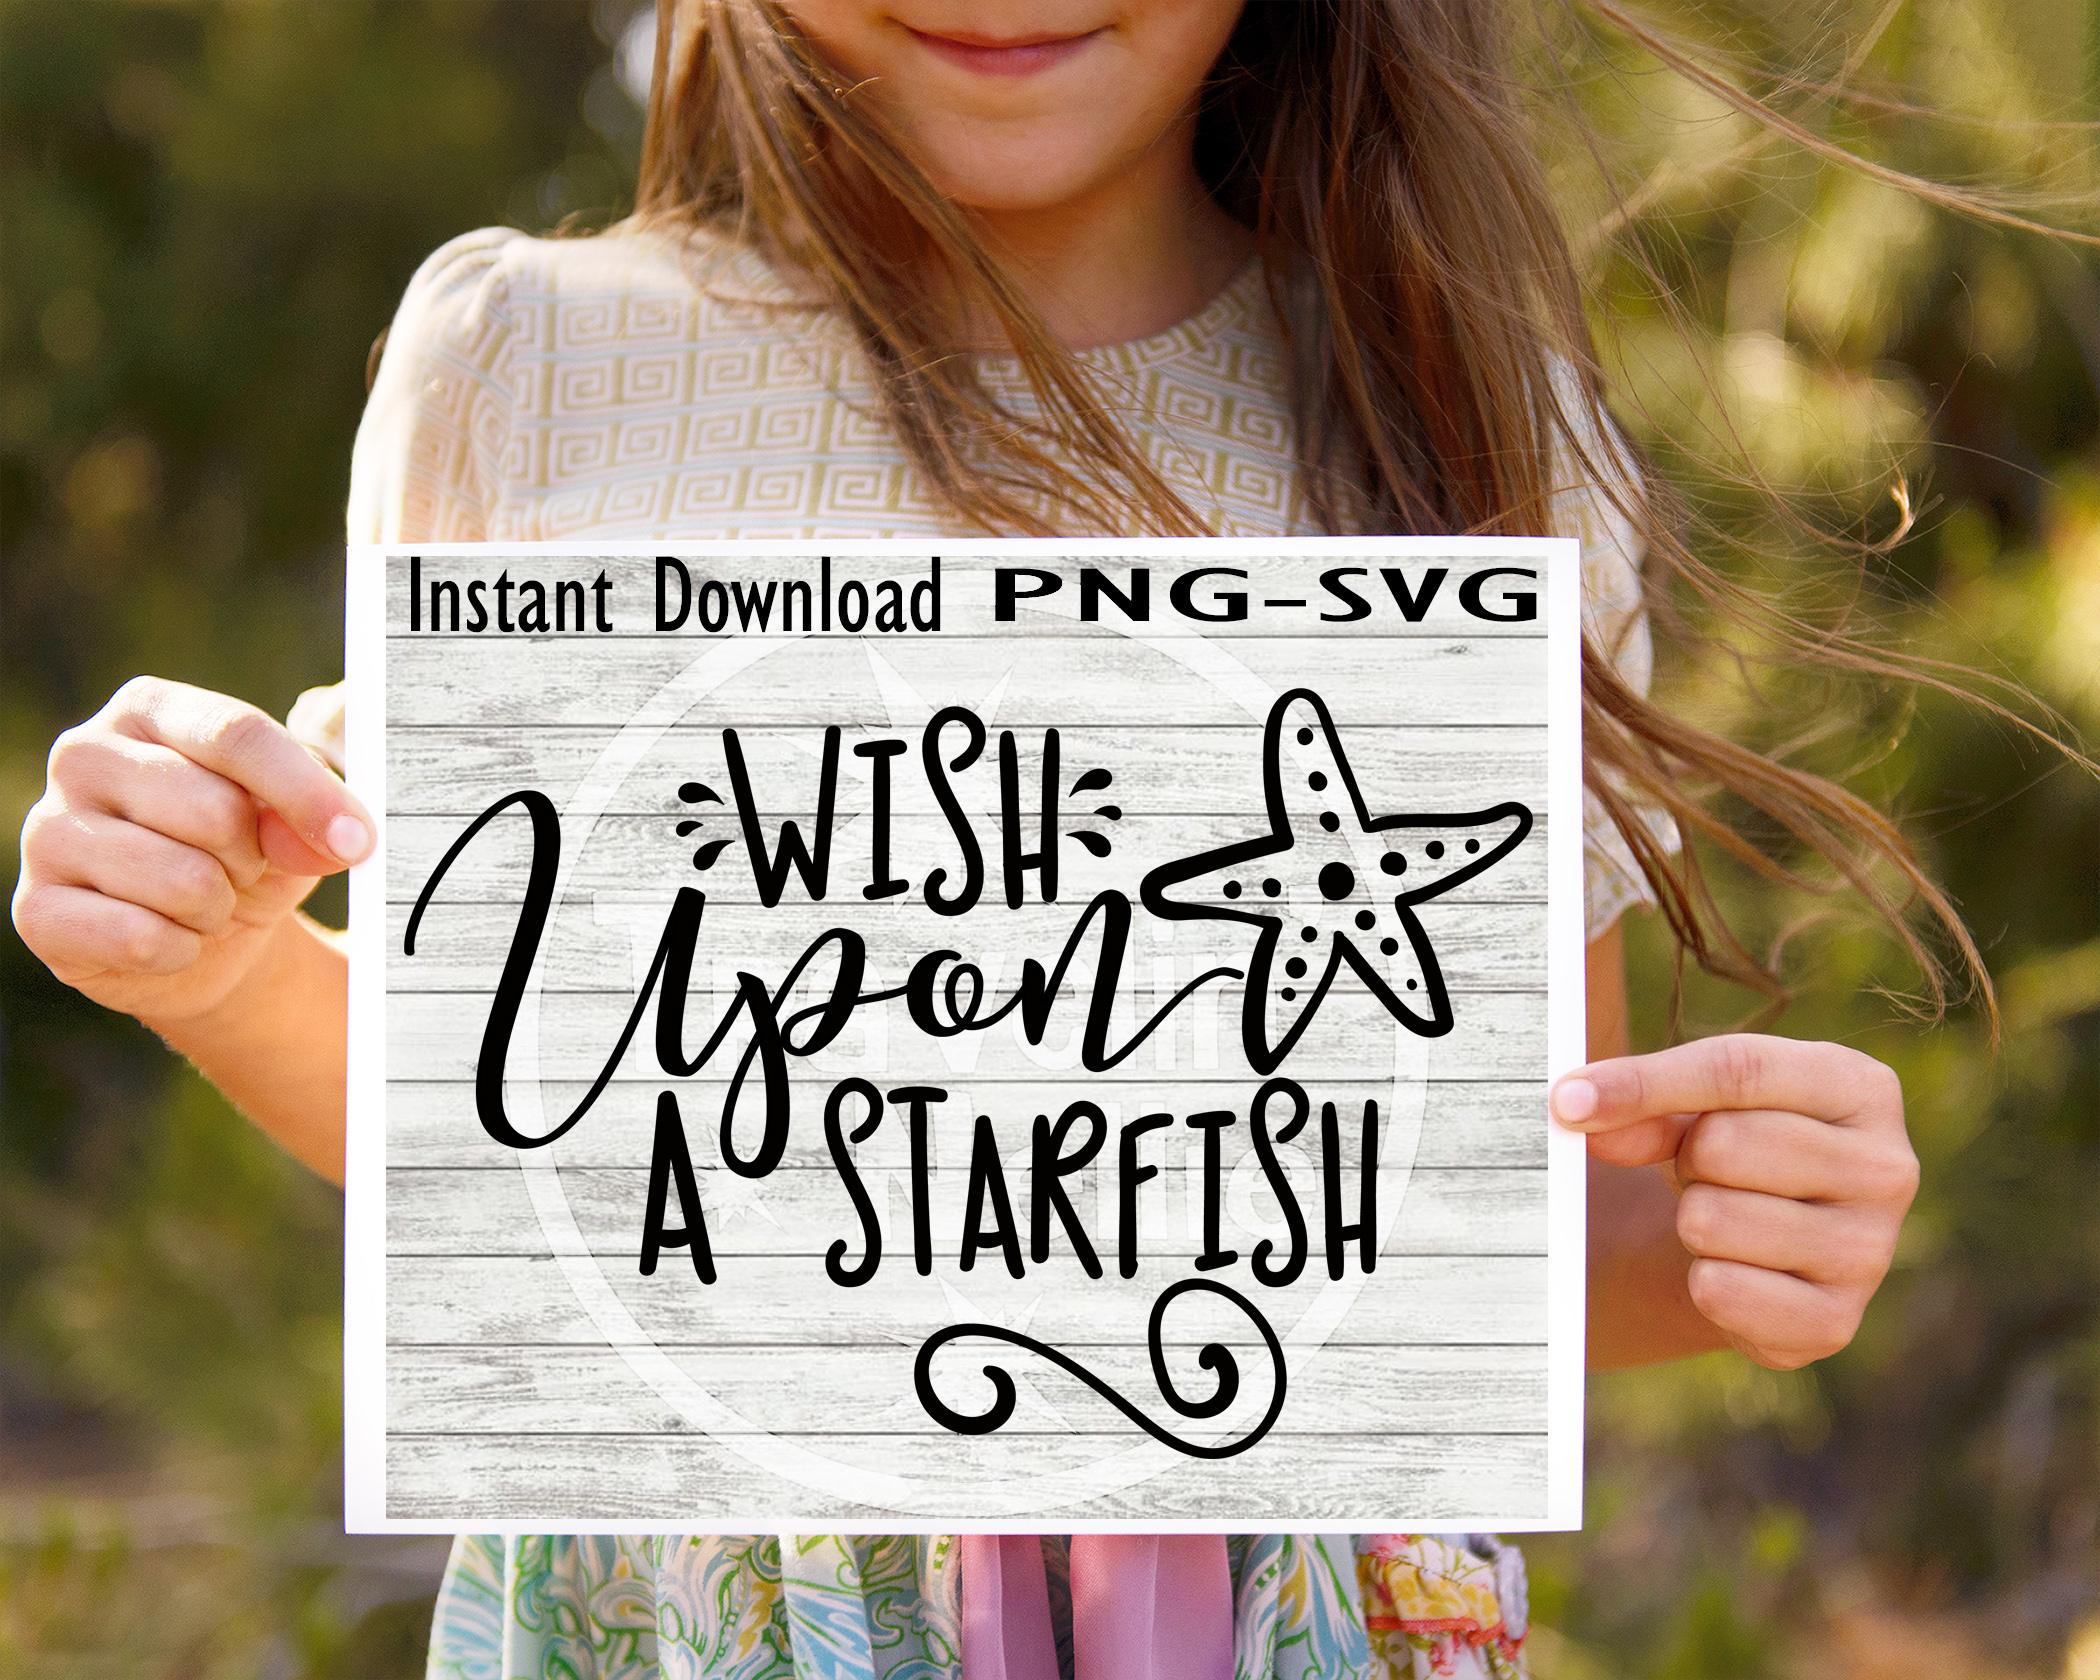 SVG Bundle, Sea SVG, Beach SVG, Collect Memories svg, Wish Upon A Starfish svg, Mermaid Kisses Svg, Starfish Wishes svg, Mermaid svg, SVG for Cricut example image 2